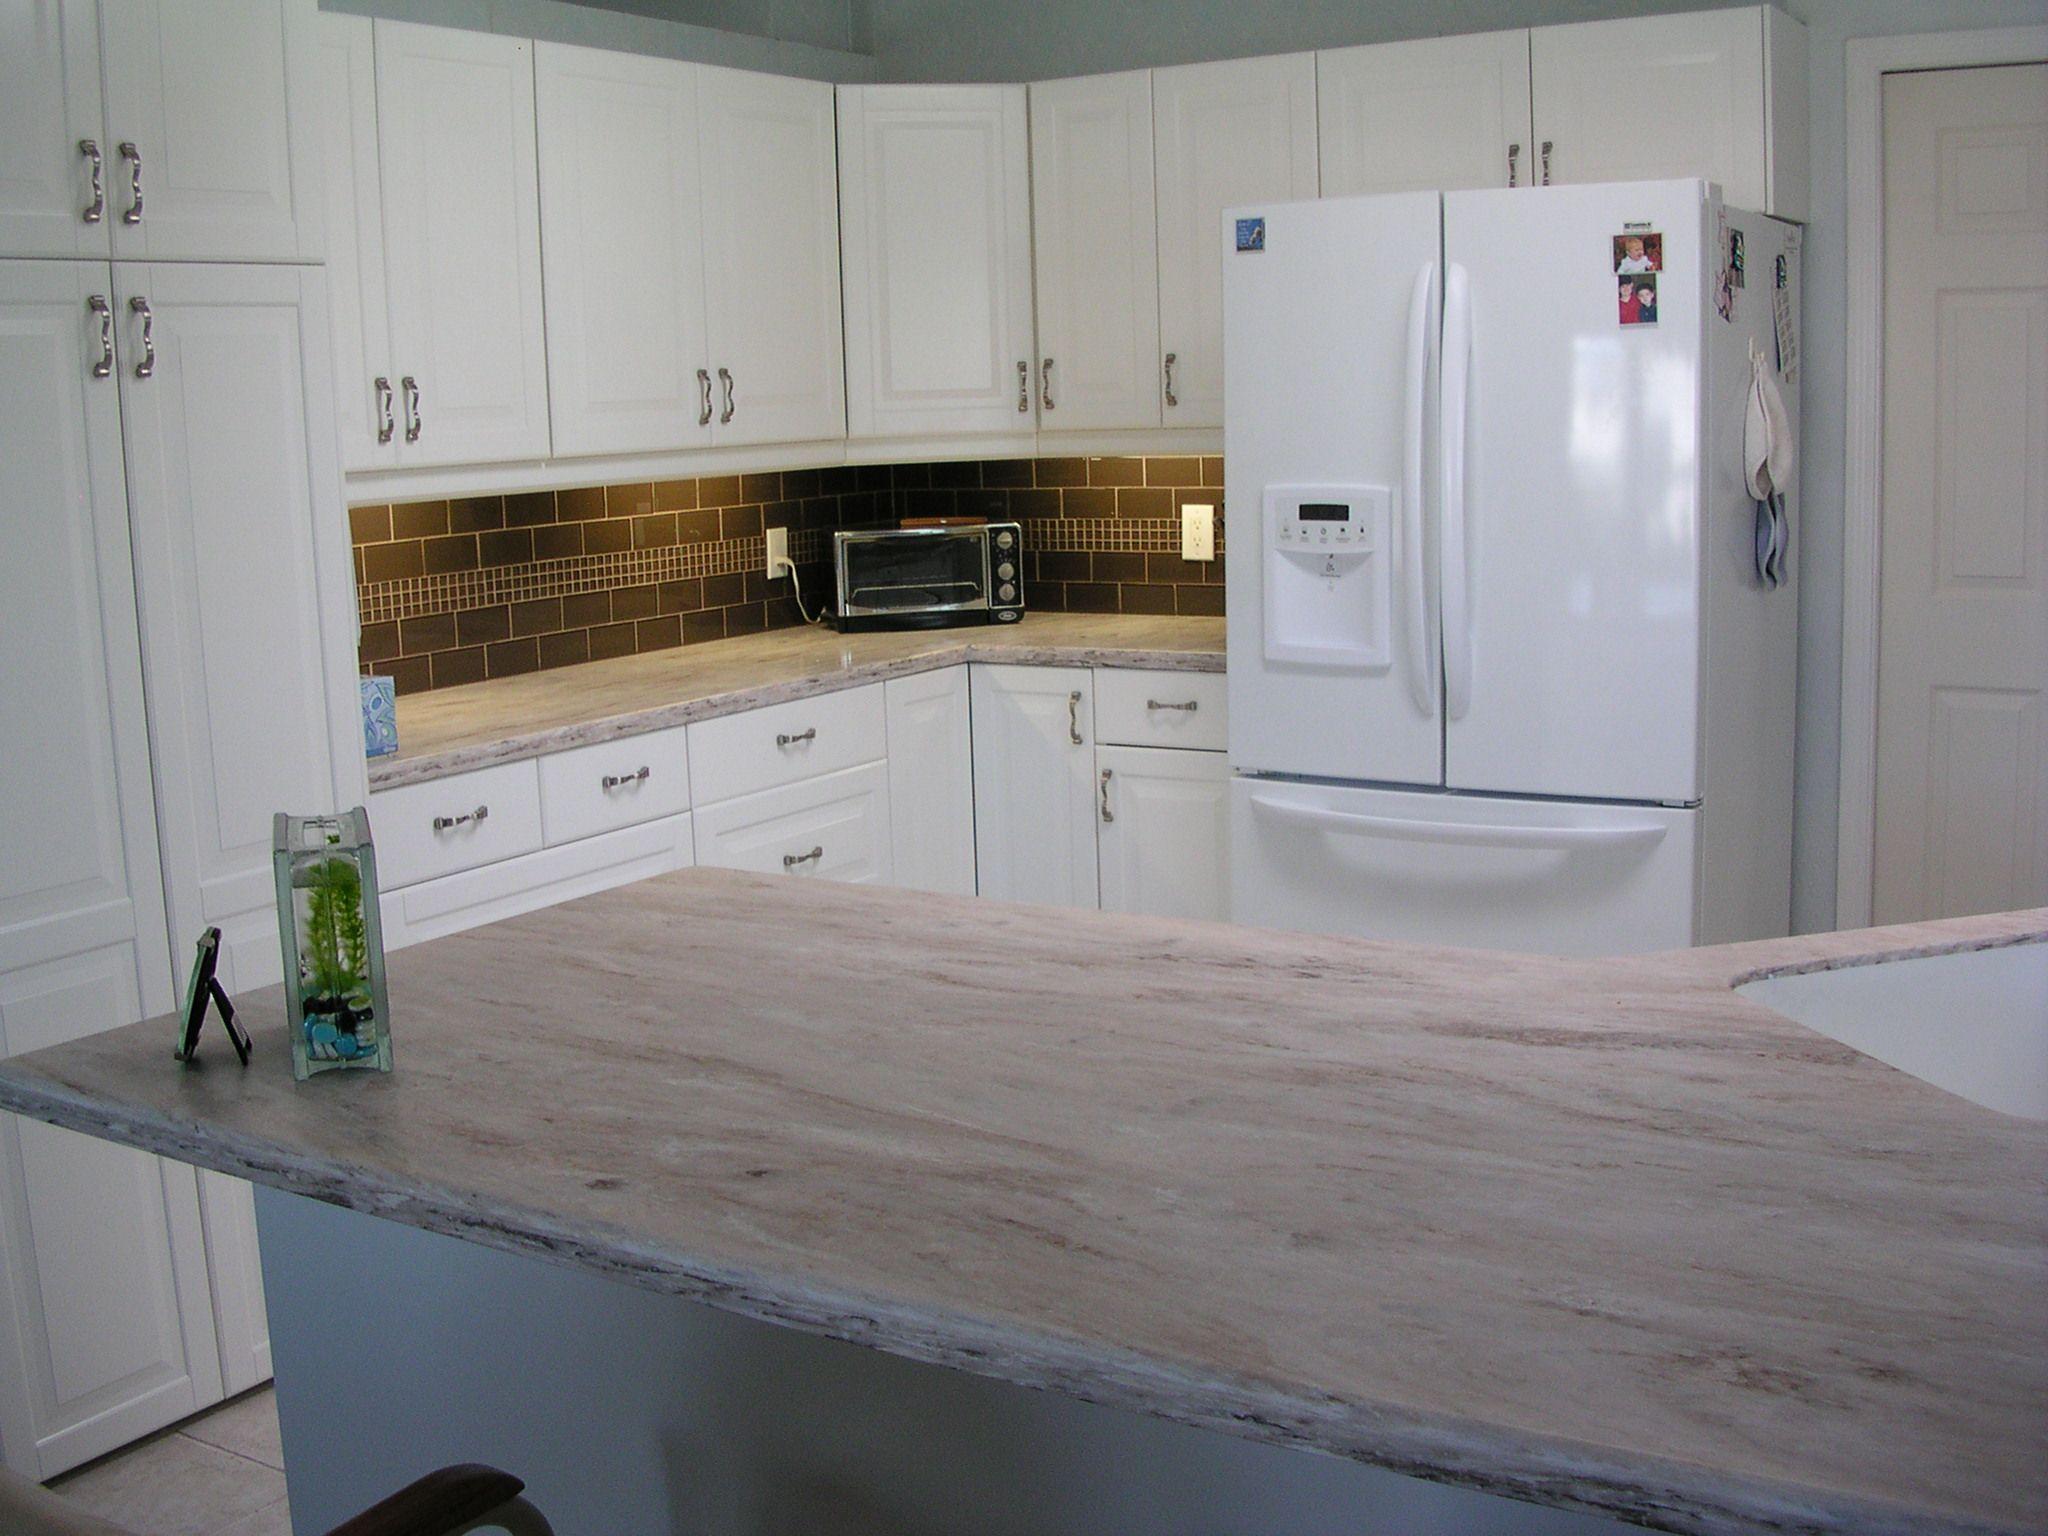 Corian Kitchen Countertops Pantry Storage Ideas Sandalwood Kitchens Pinterest